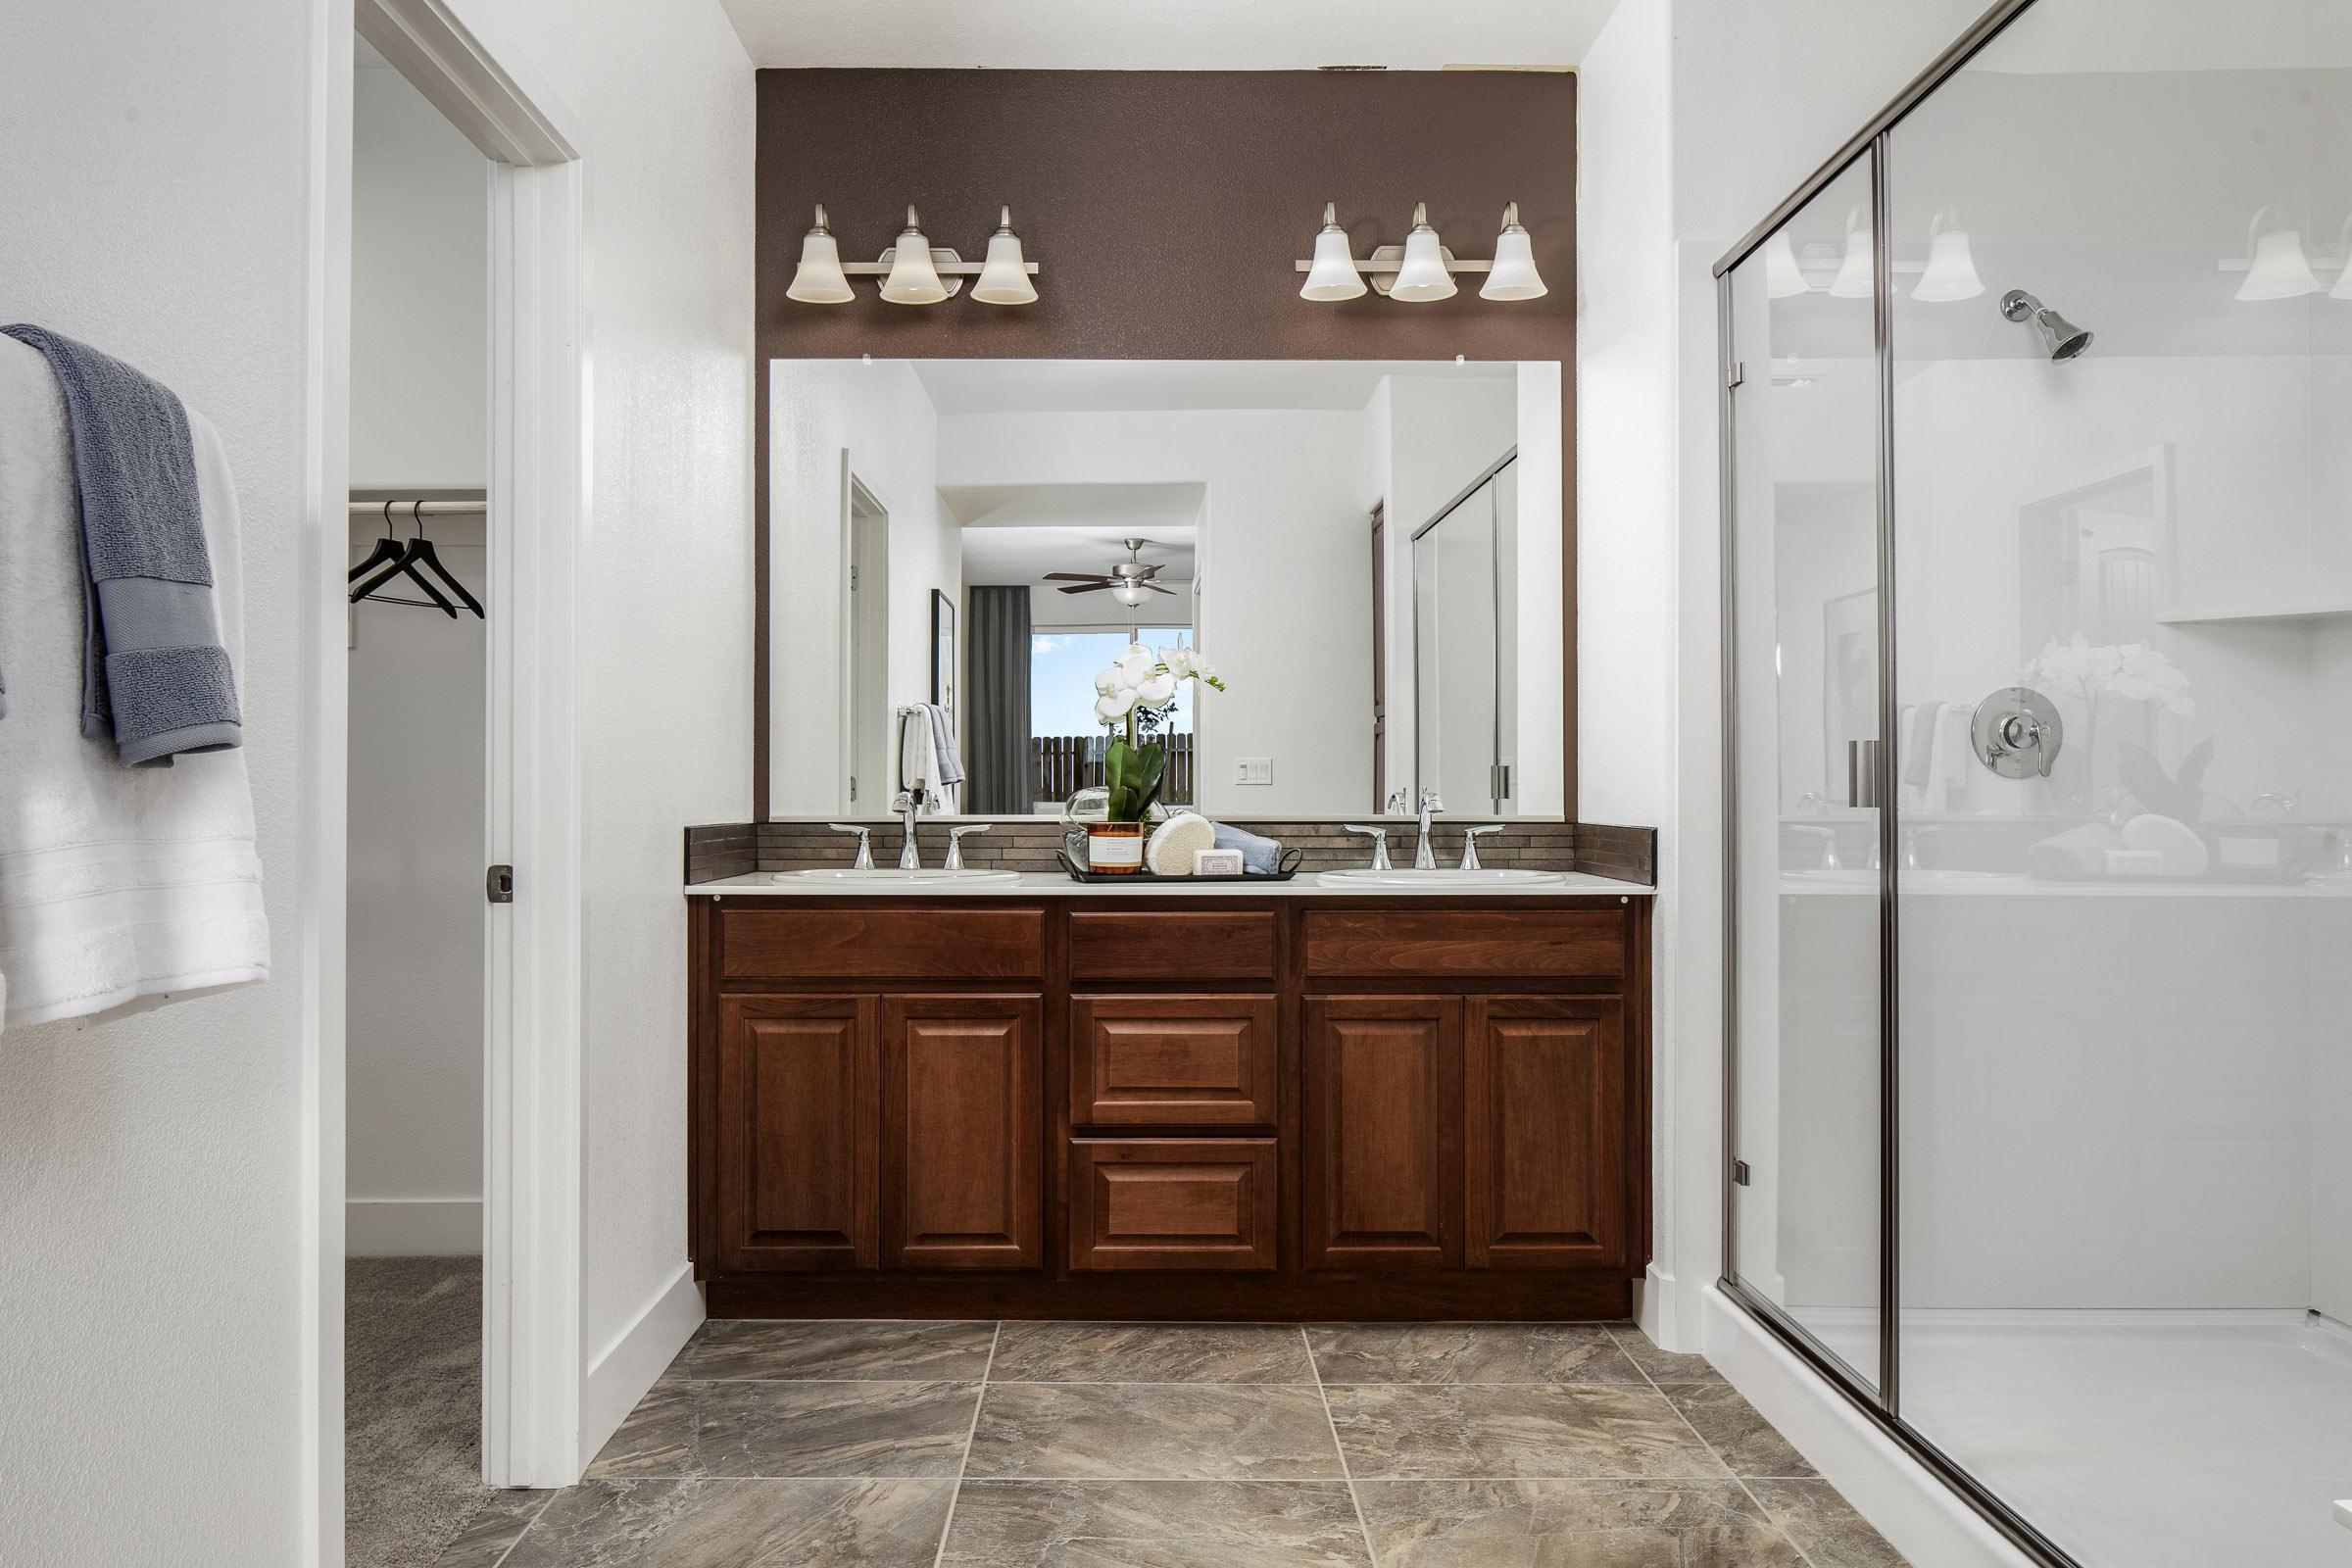 Bathroom featured in the Plan 1 By Watt Communities in Sacramento, CA